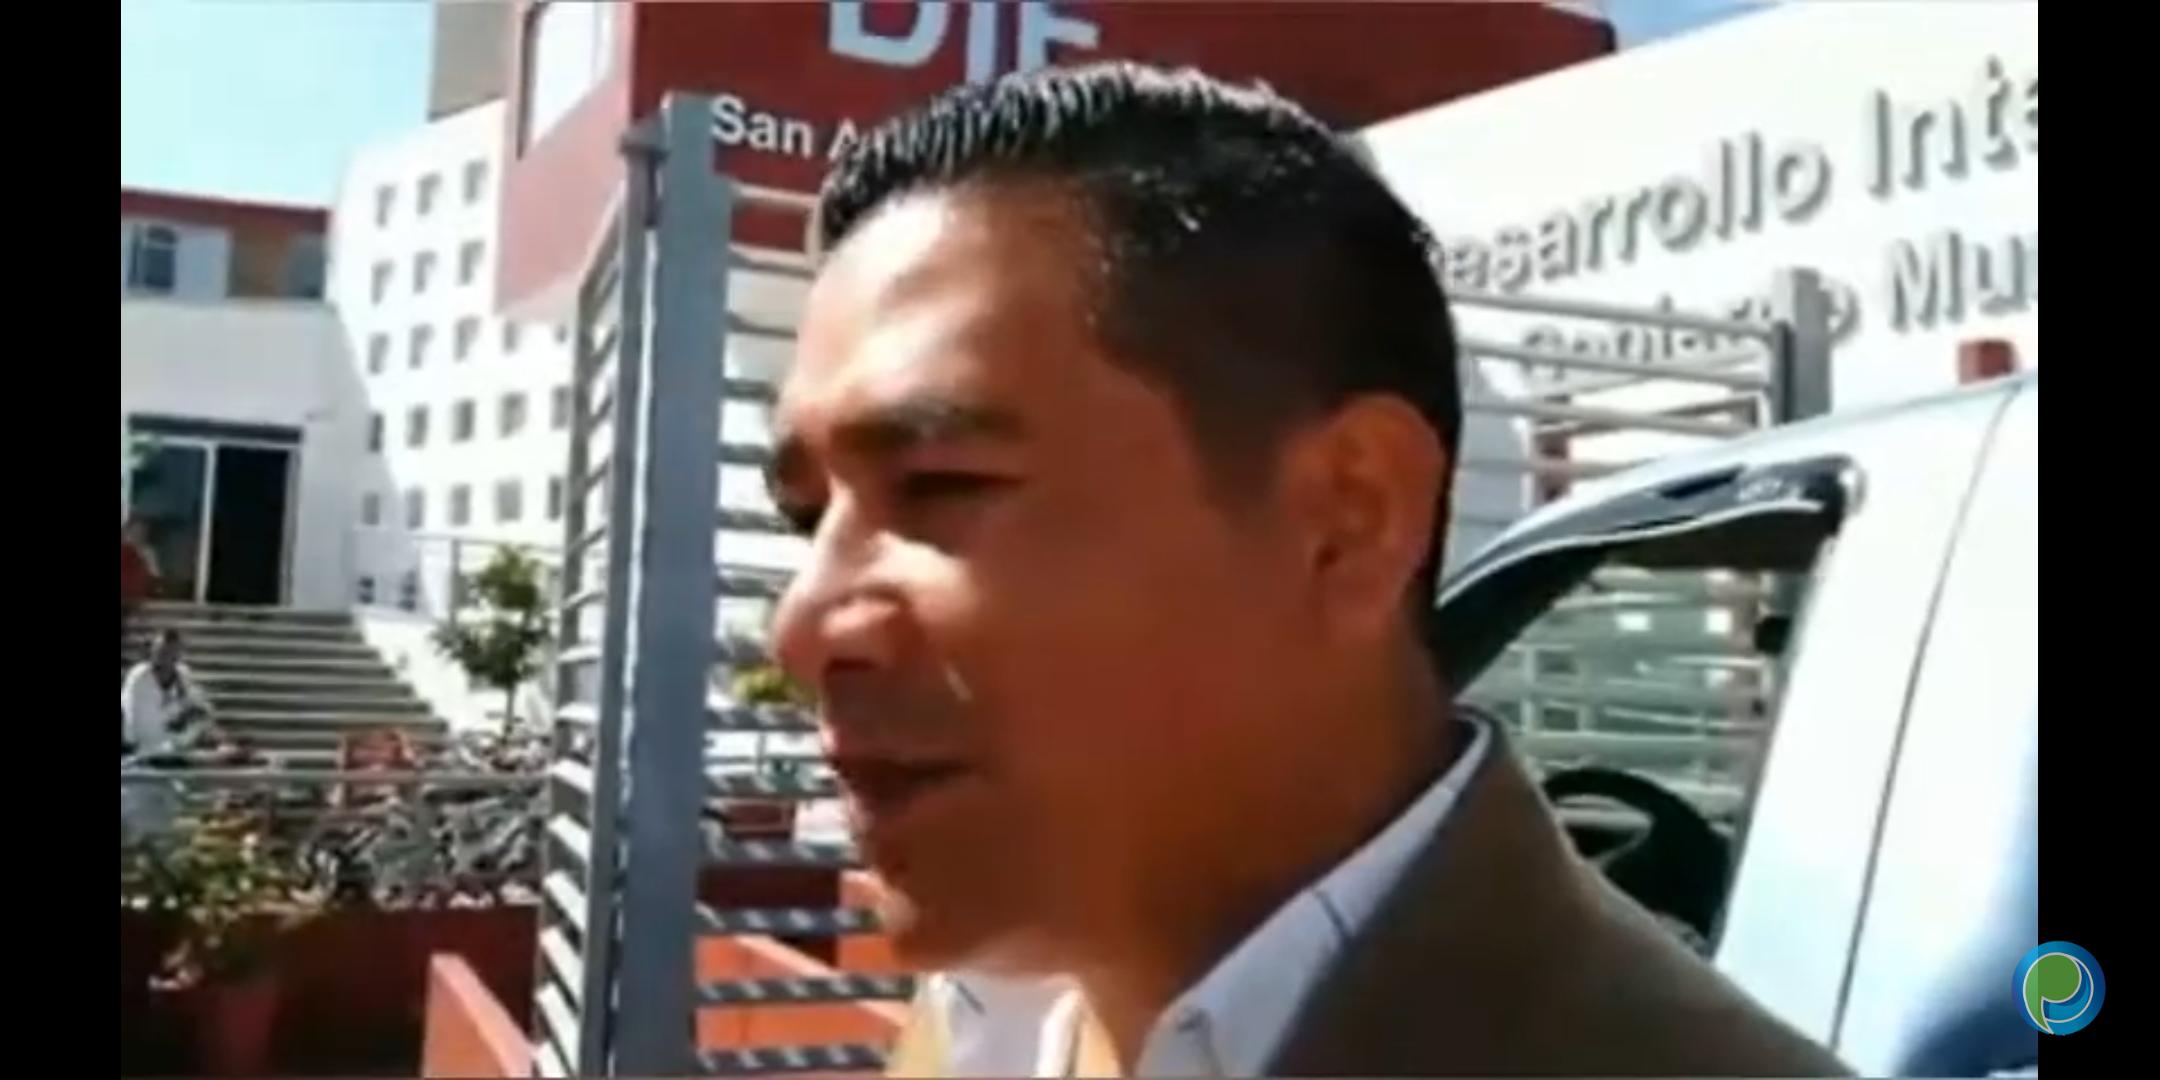 Síndico de San Andrés Cholula confirmó que siguen los procesos legales contra ex funcionarios